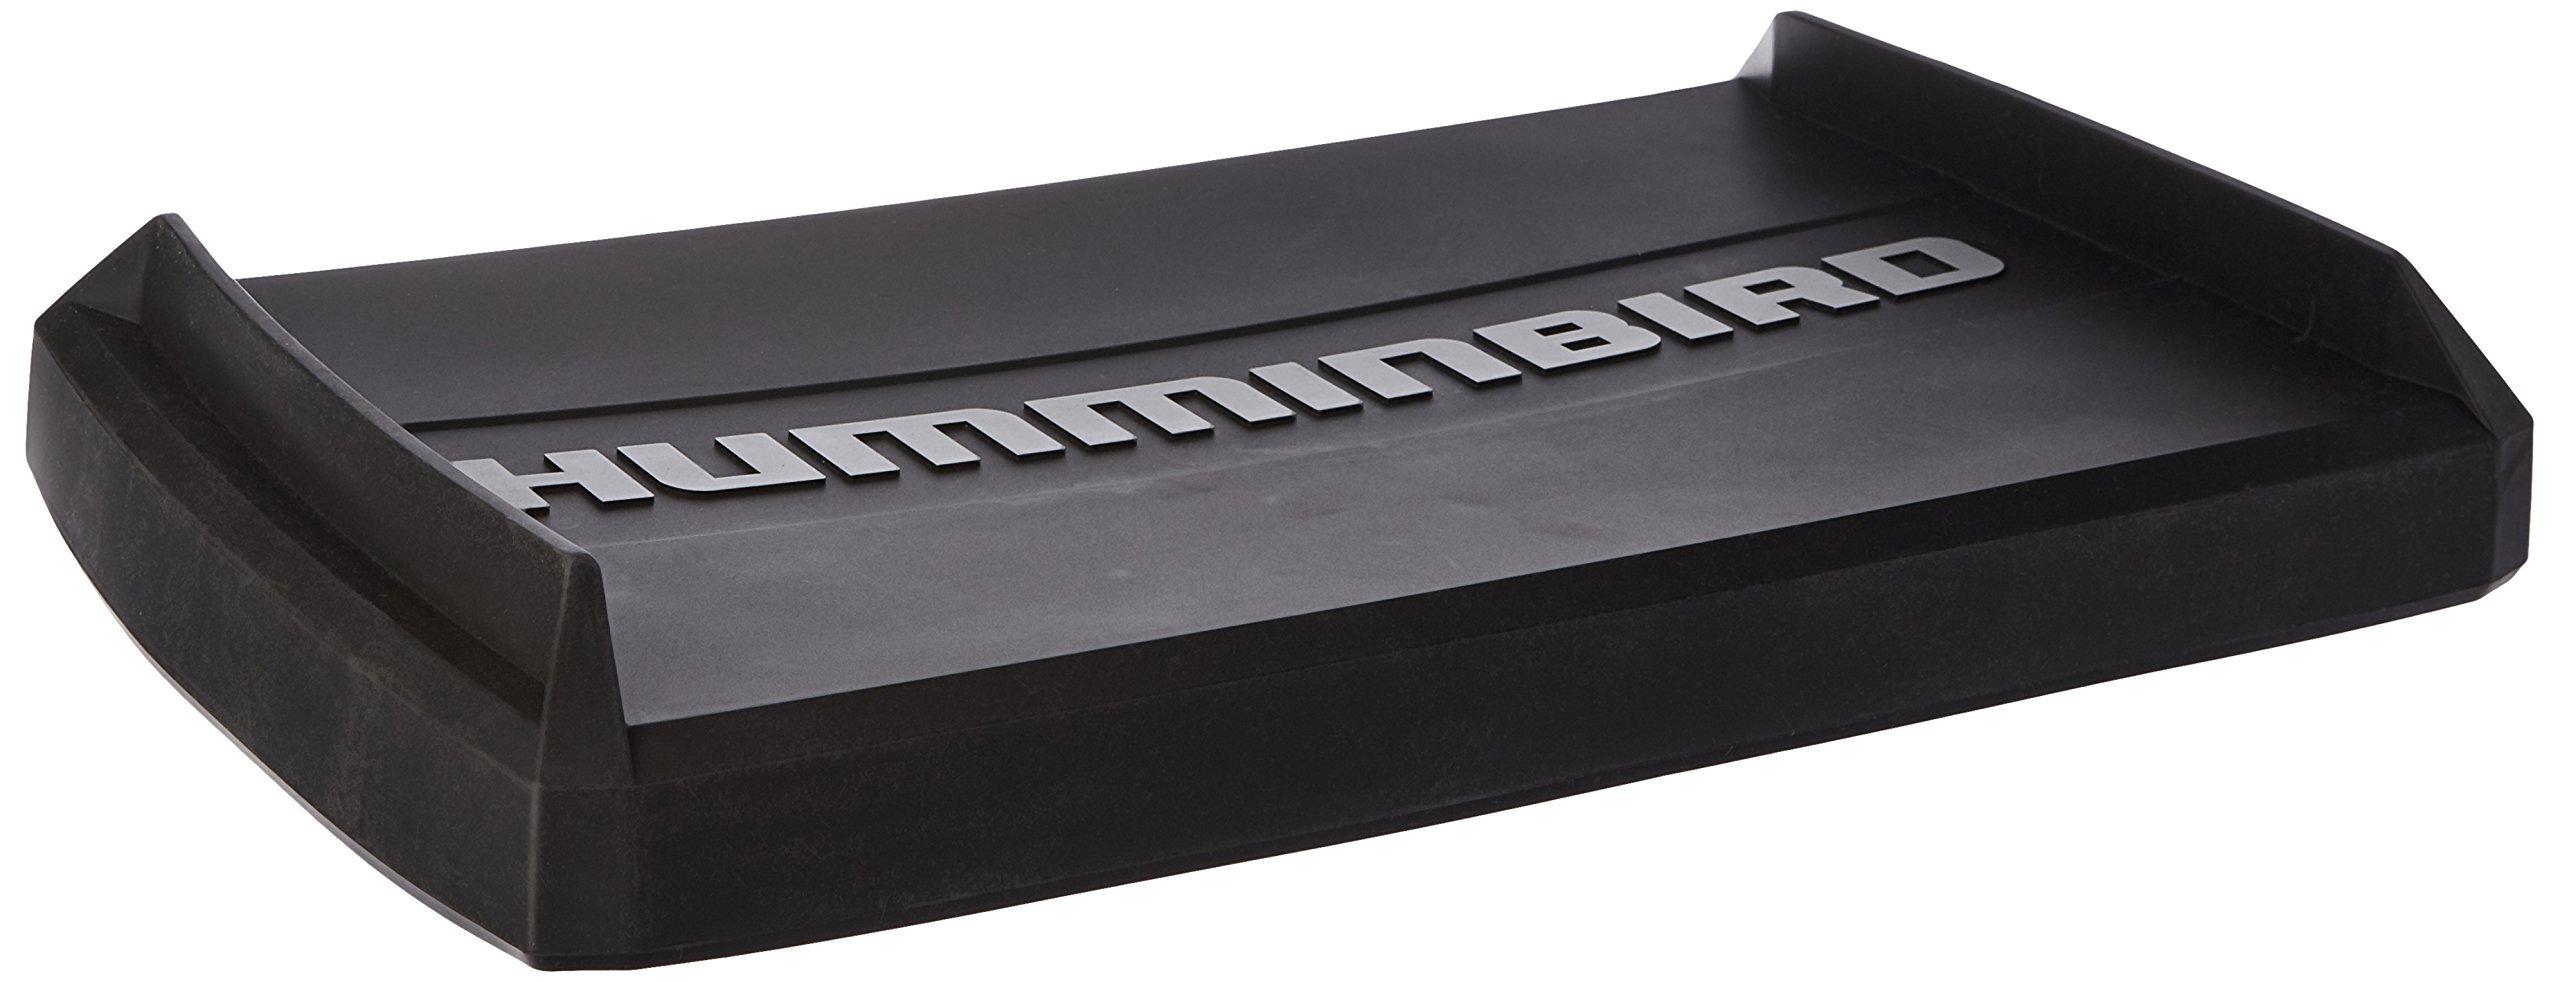 Humminbird 780031-1 Unit Cover - UC H12